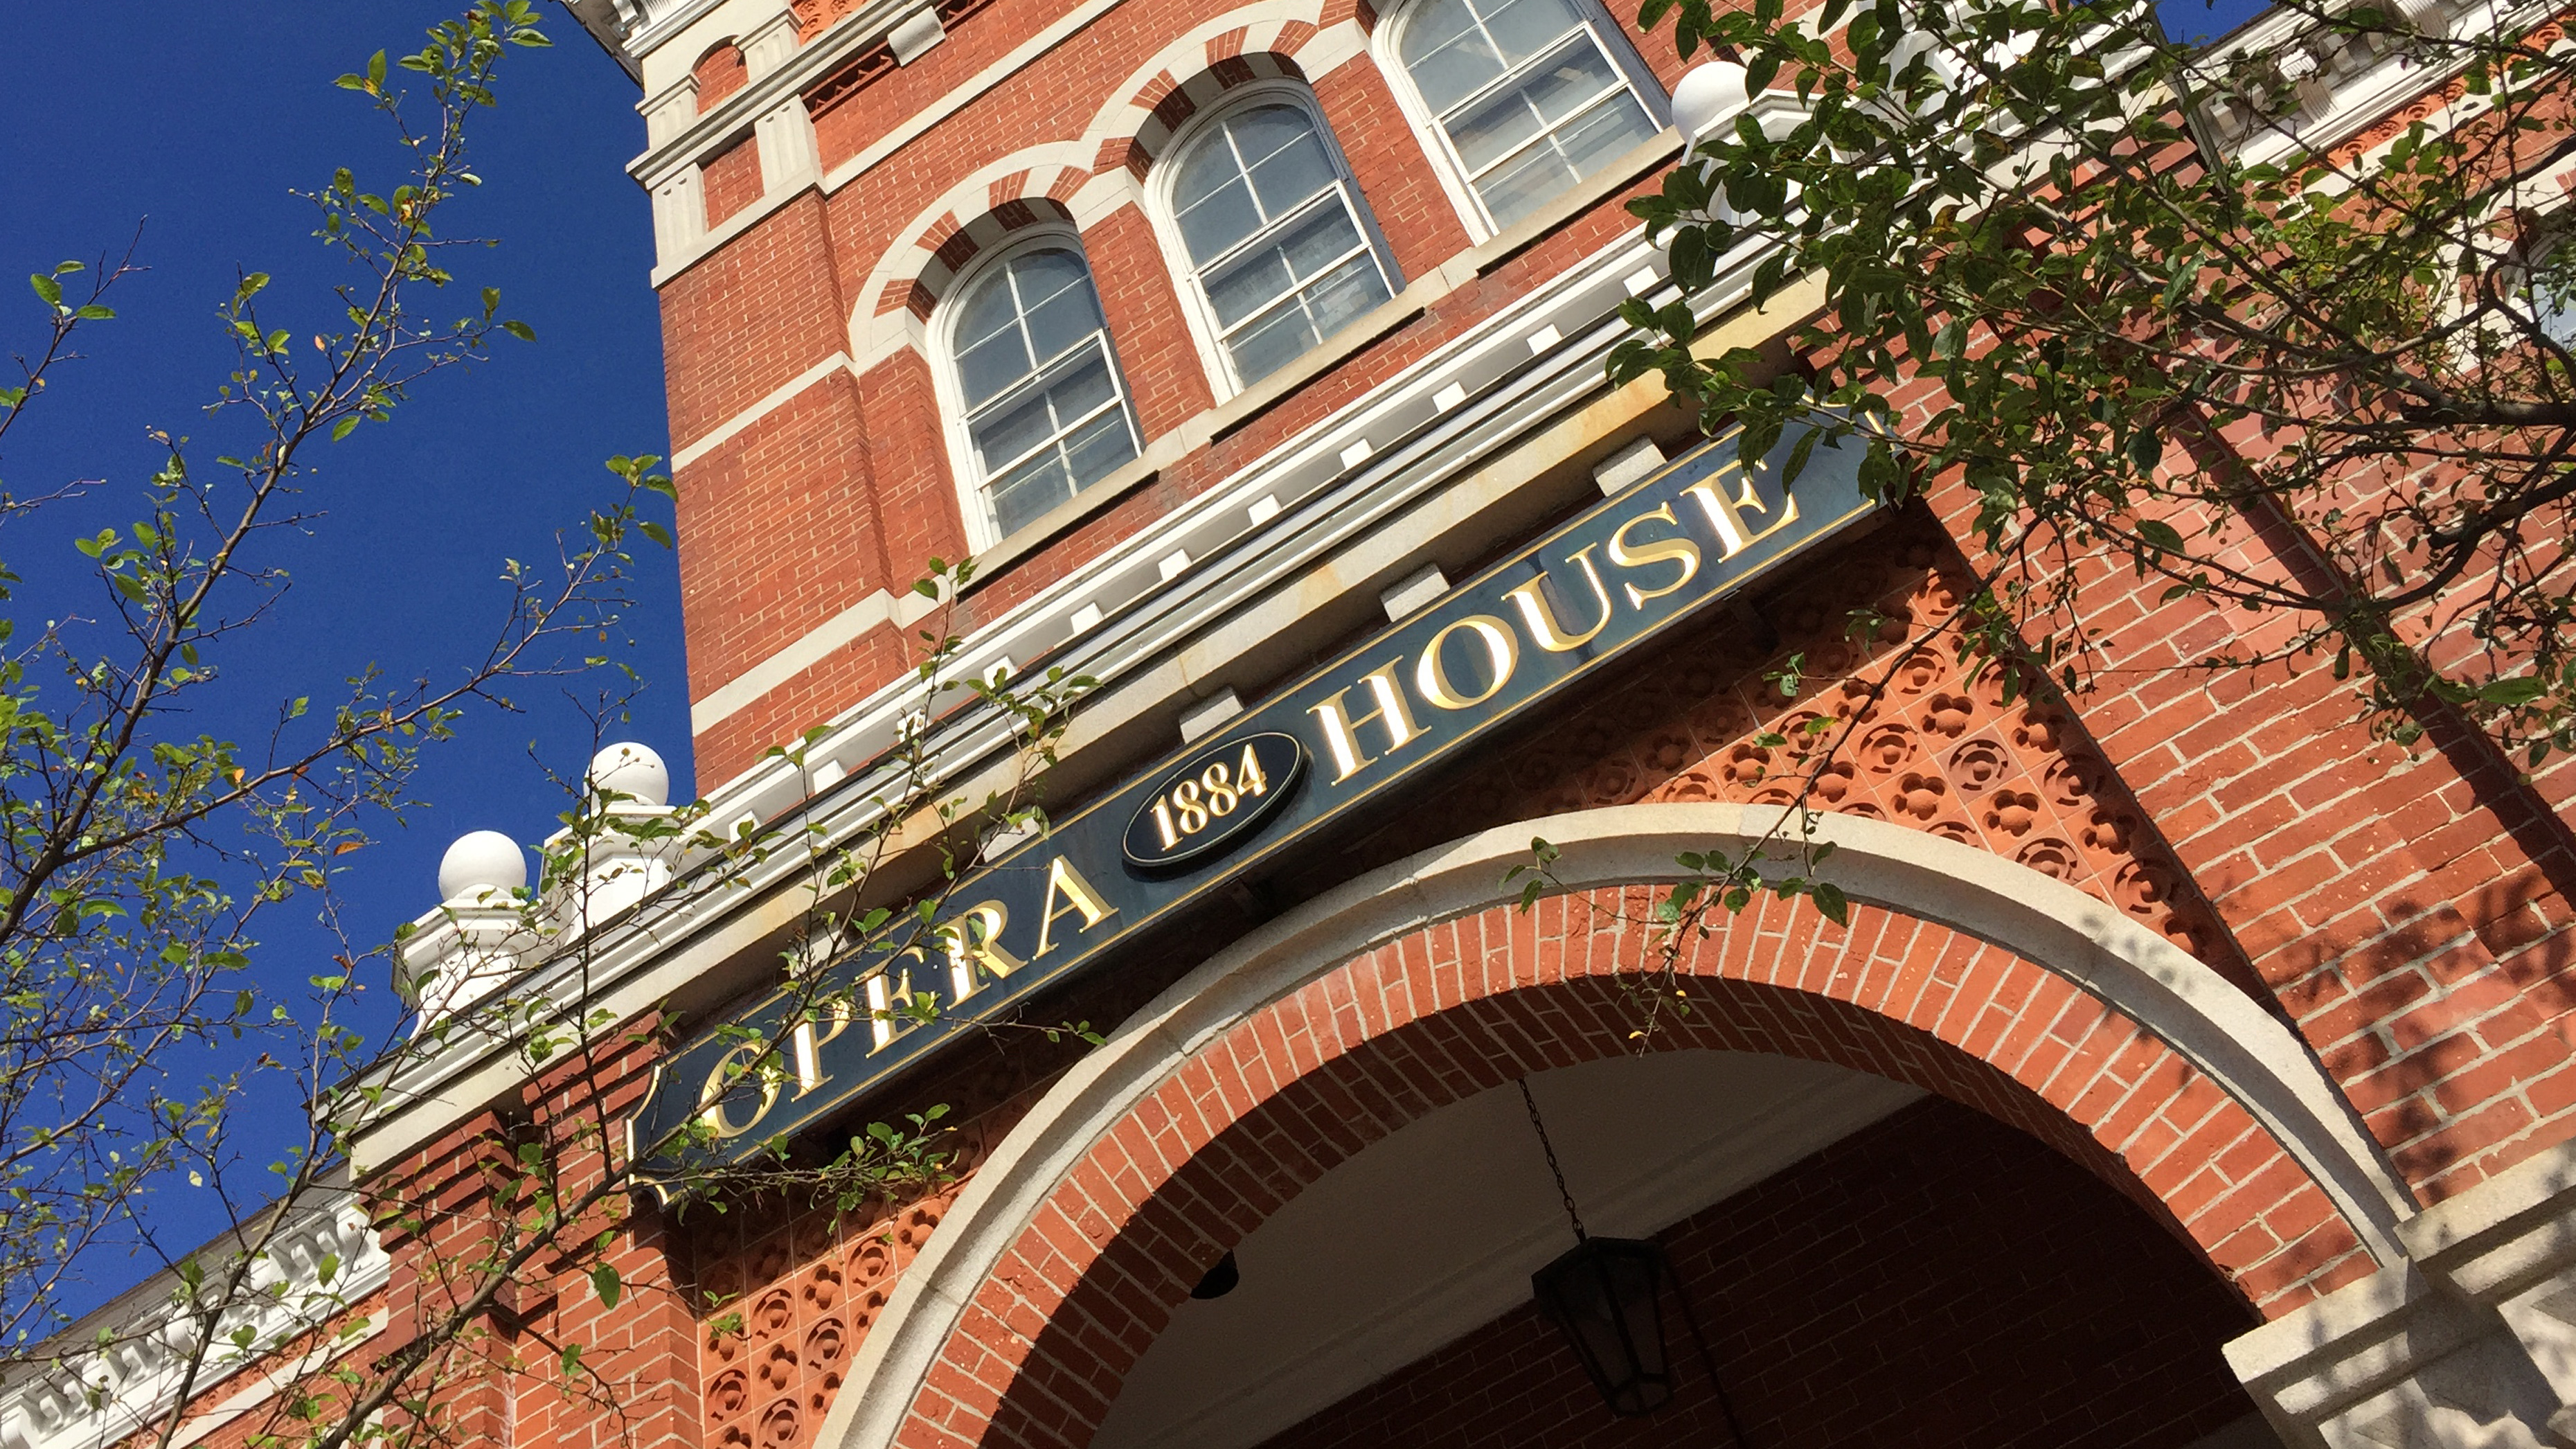 Front facade of the Thomaston Opera House on Main Street in Thomaston, CT